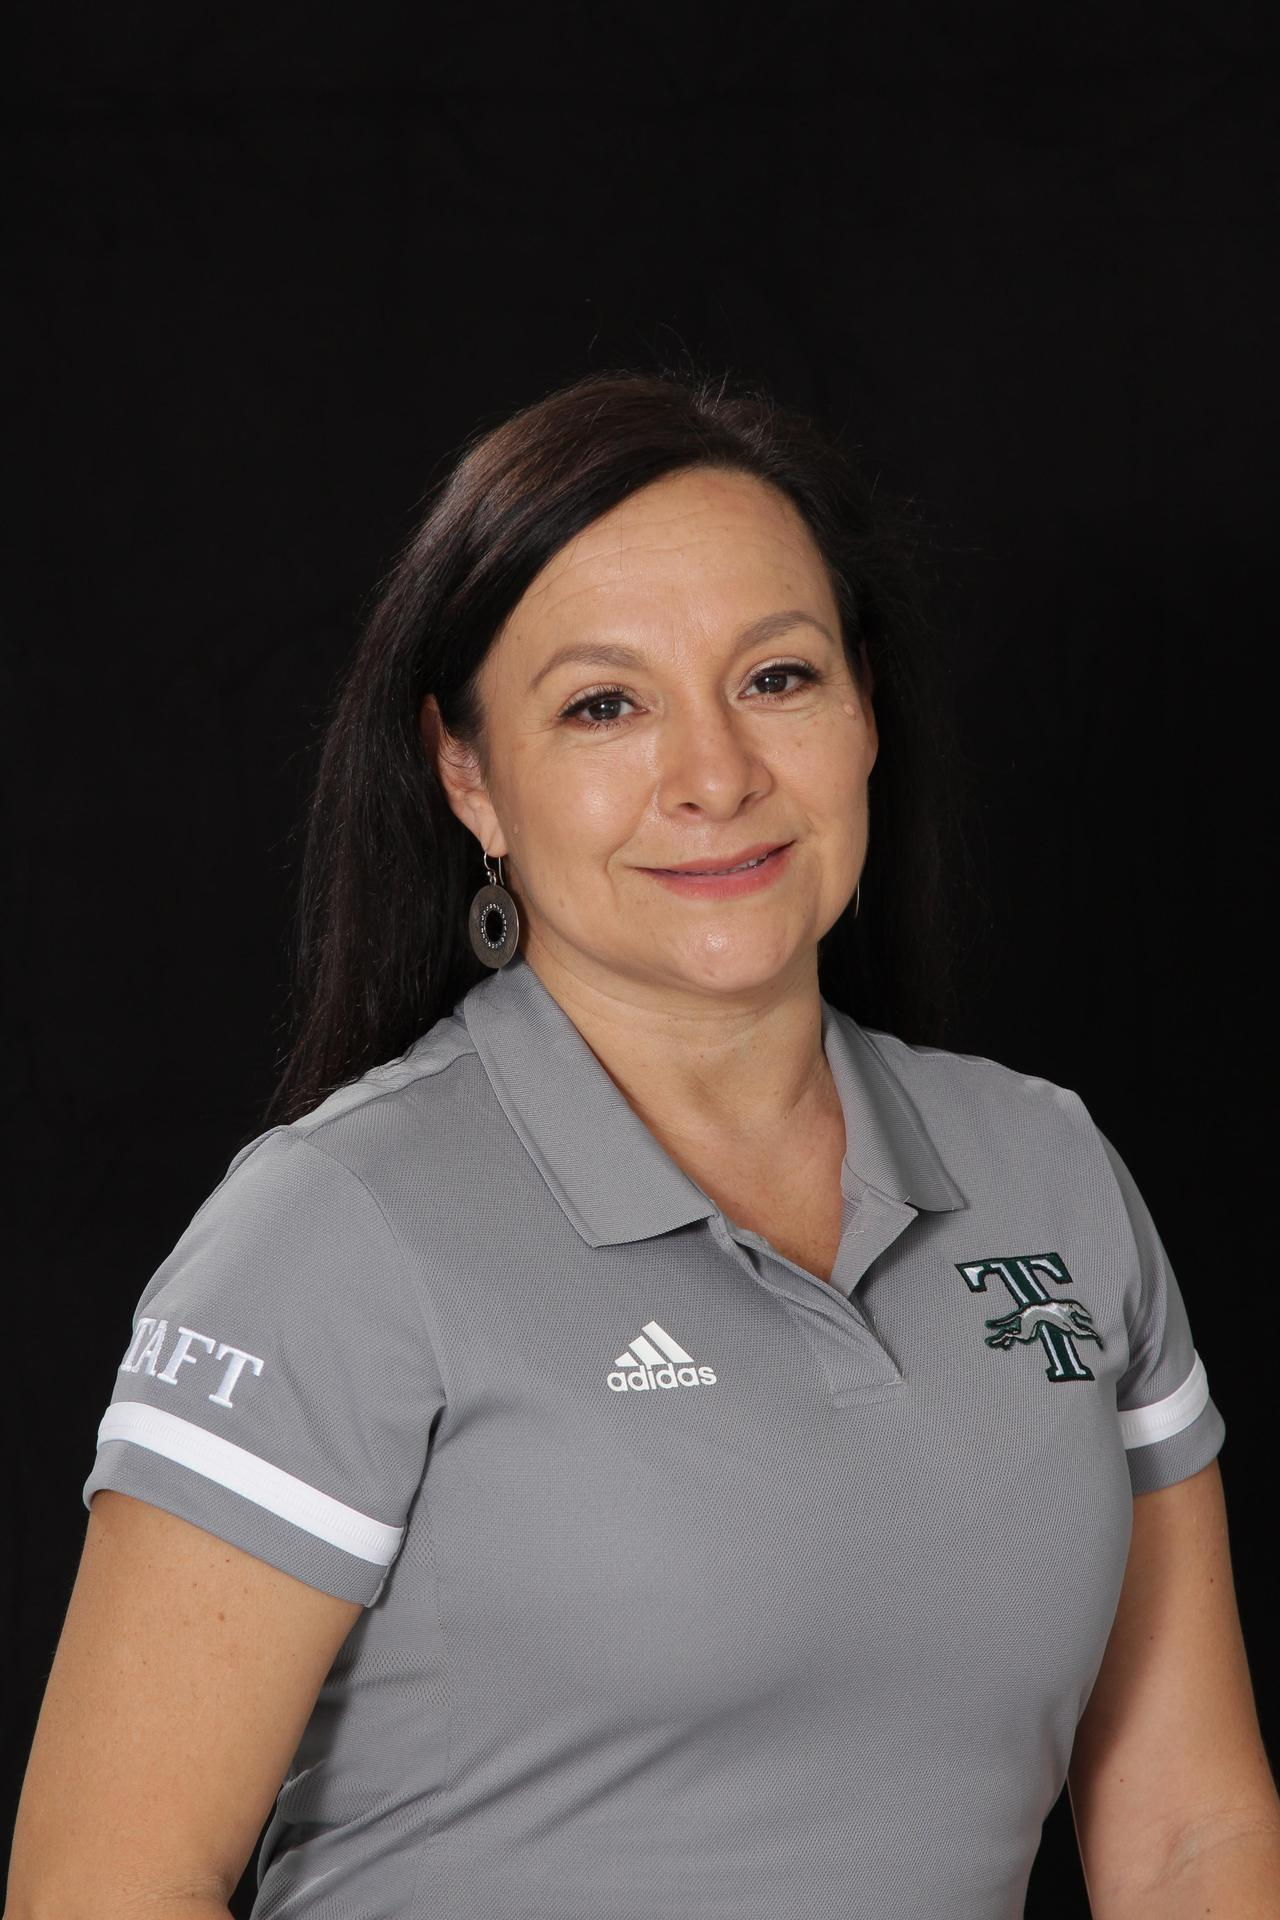 Vice President - Diana Buendia